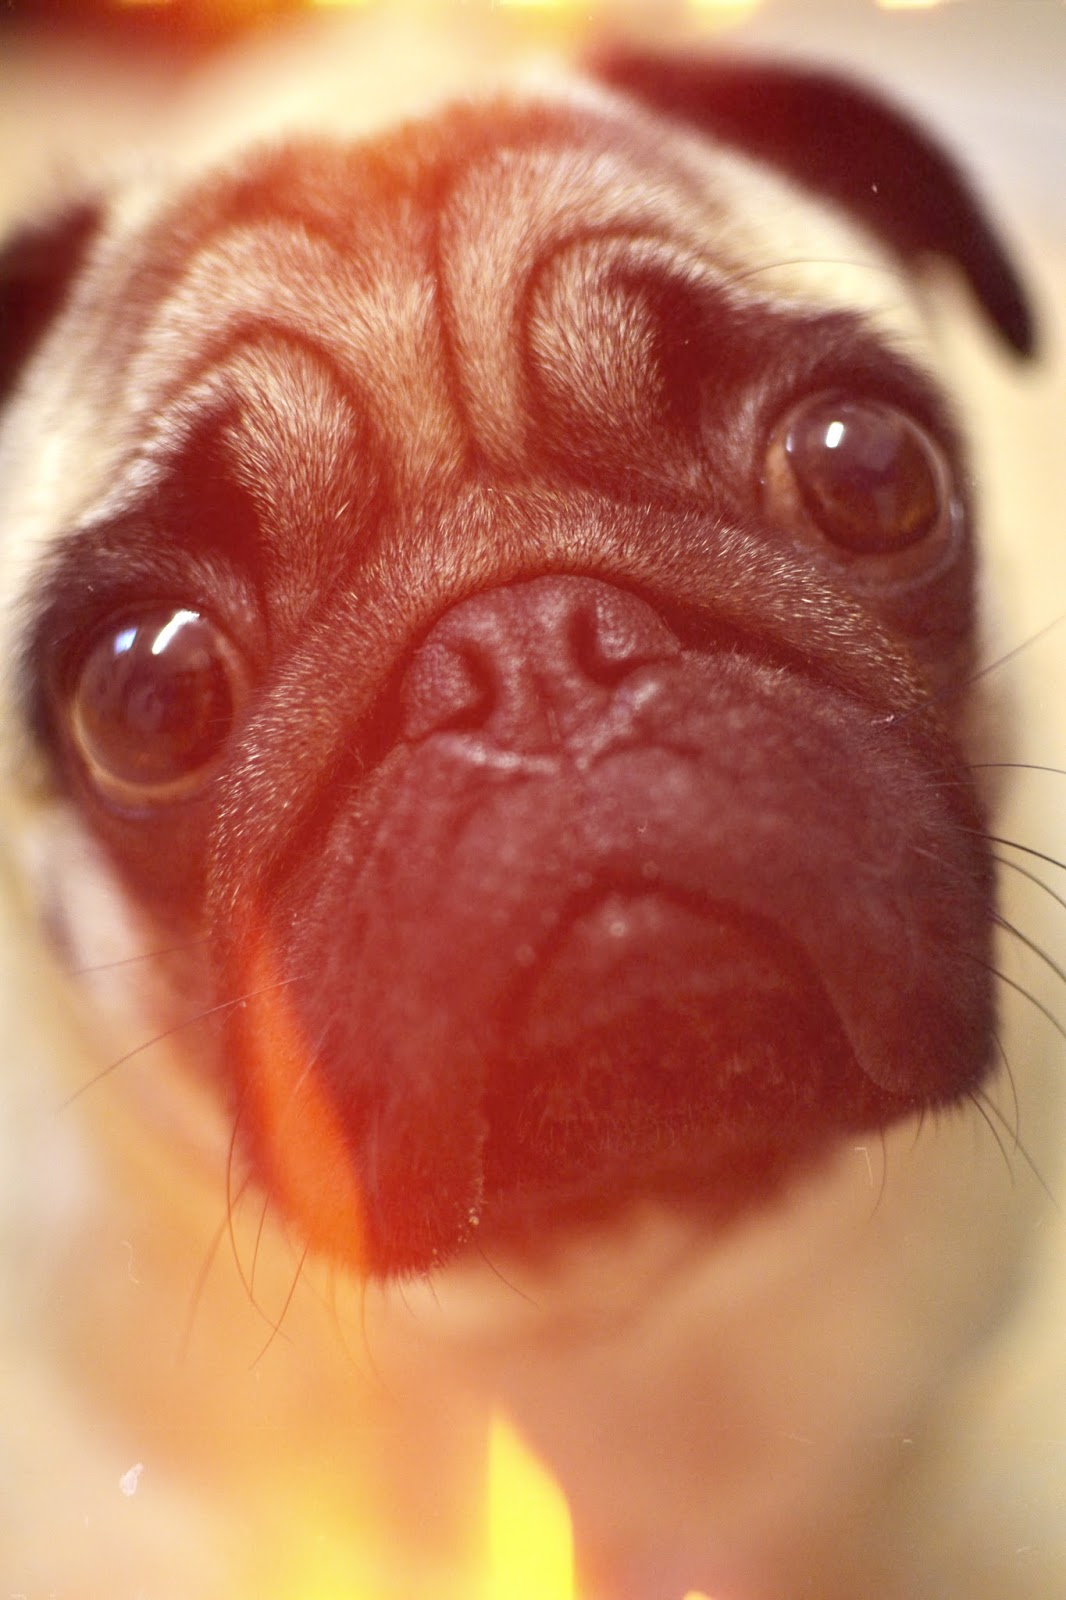 Pug, lomo, lomography, cute, dog